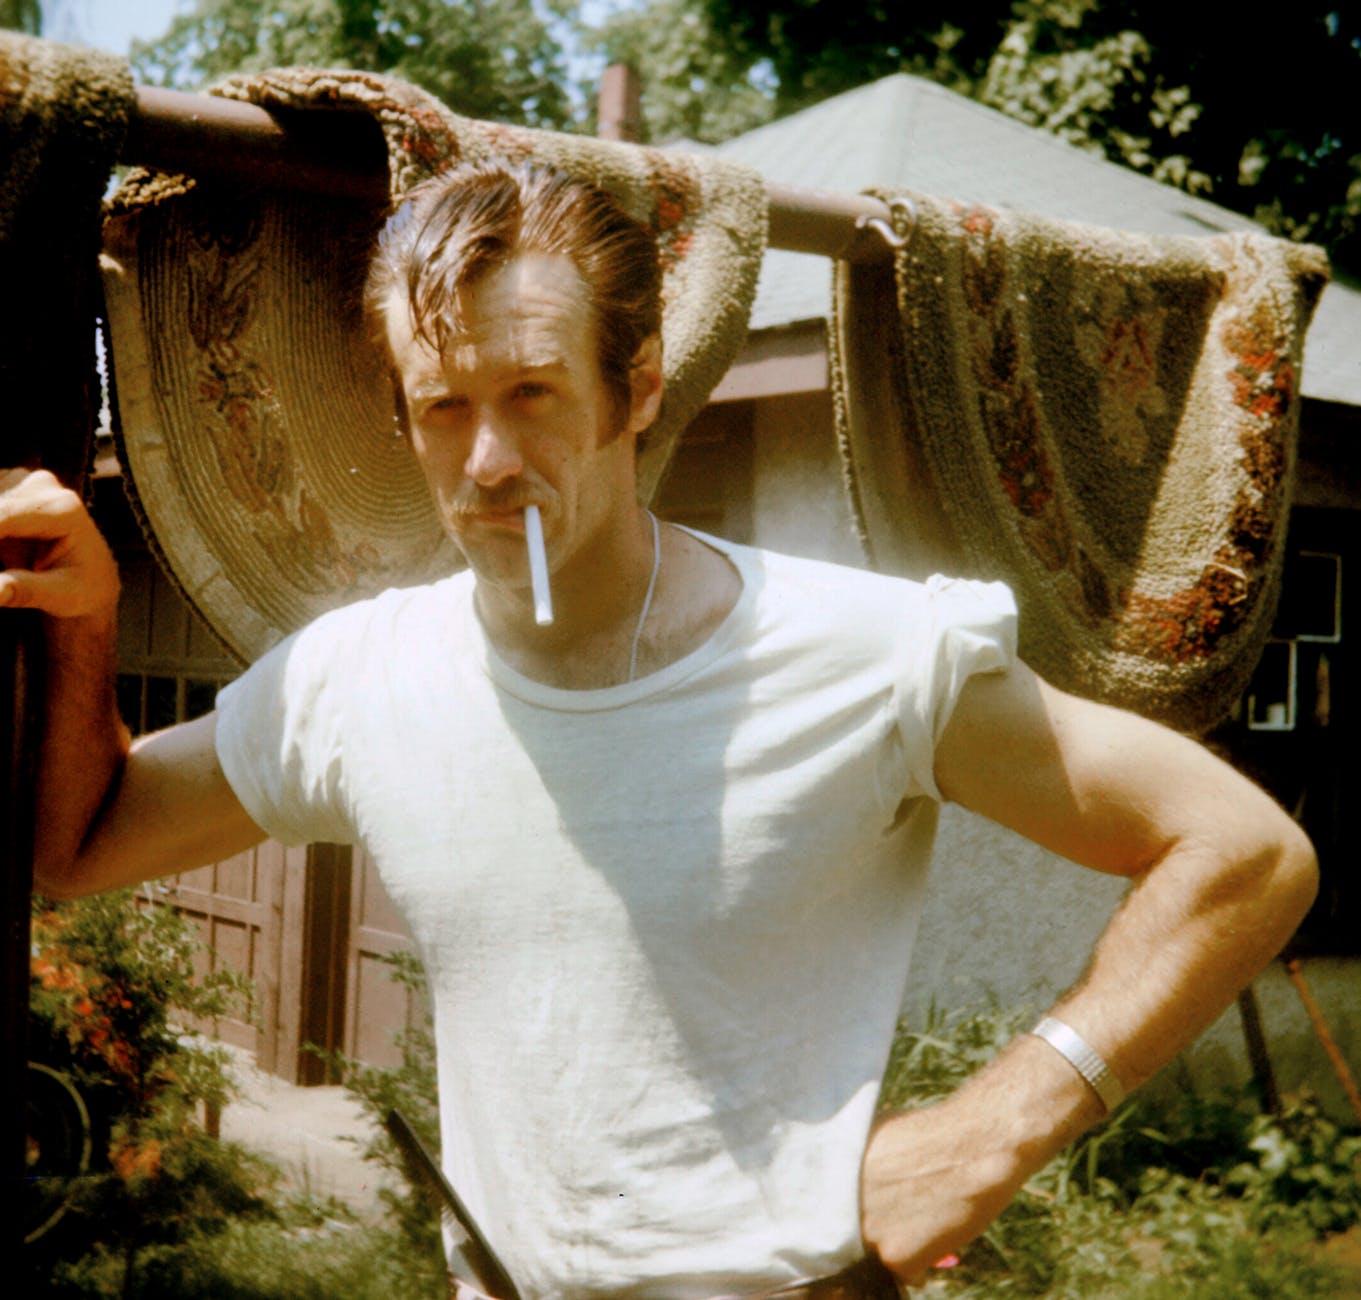 photo of man smoking cigarette